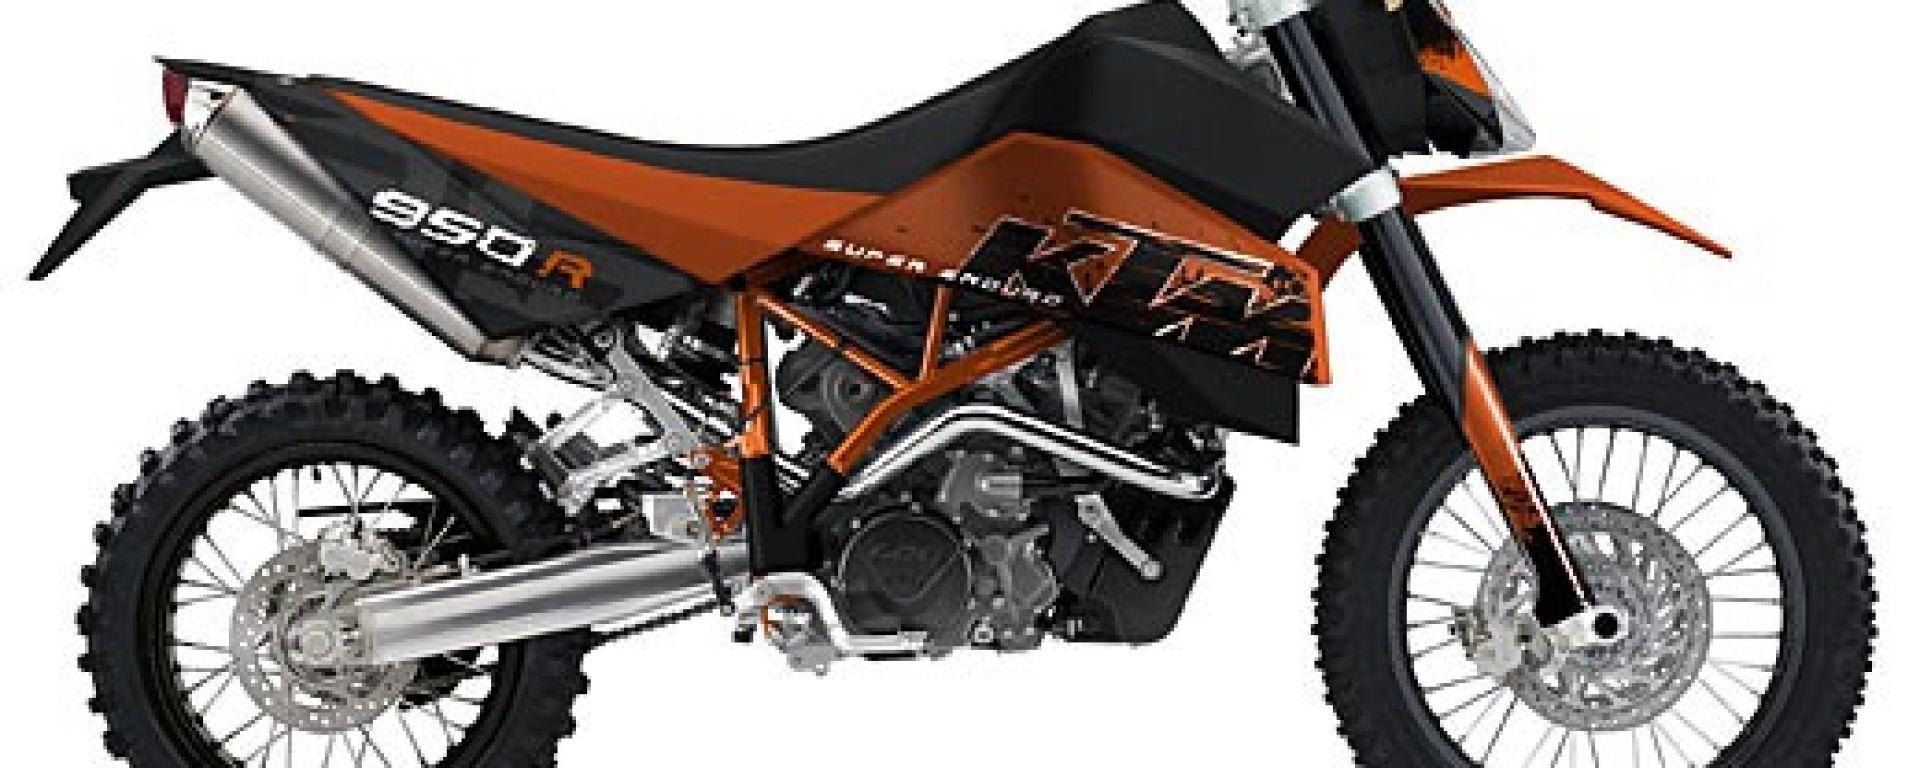 KTM Super Enduro R